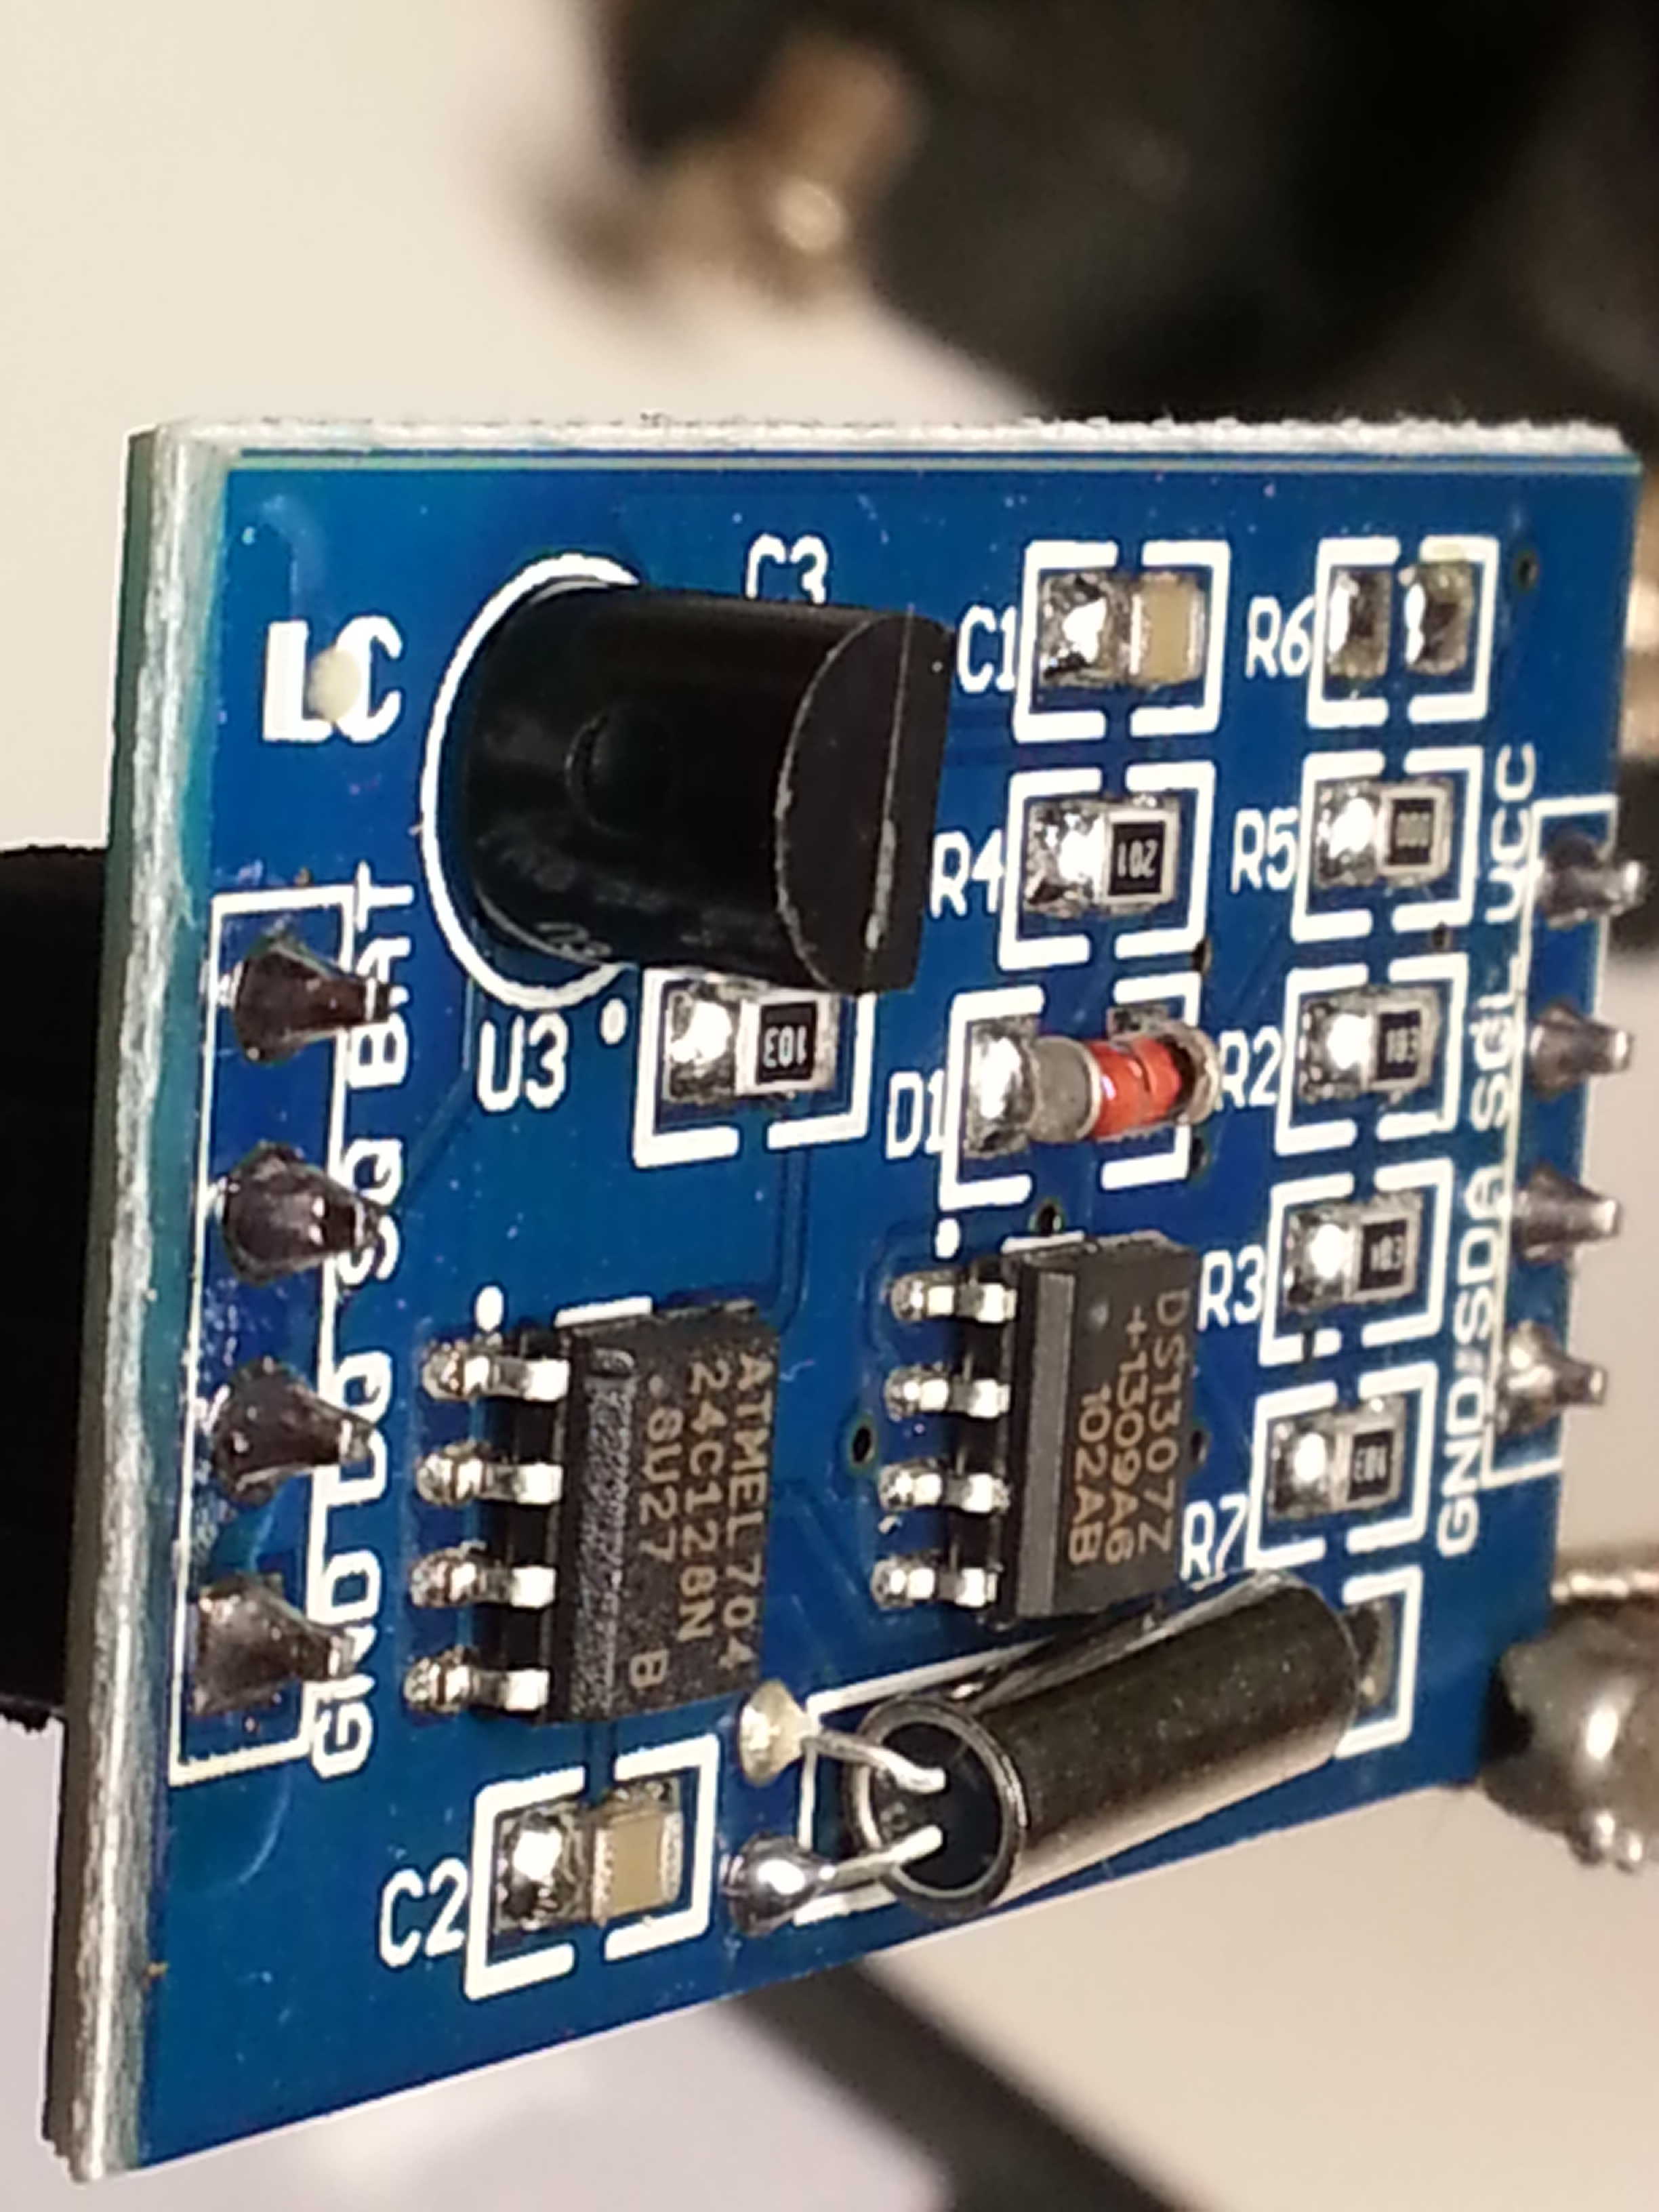 Ds1307 Real Time Clock At24c128 Storage Ds18b20 Temperature Sensor Ds1307realtimeclockschematic Rtc Temp Cr1220 Chiosz Robots 1